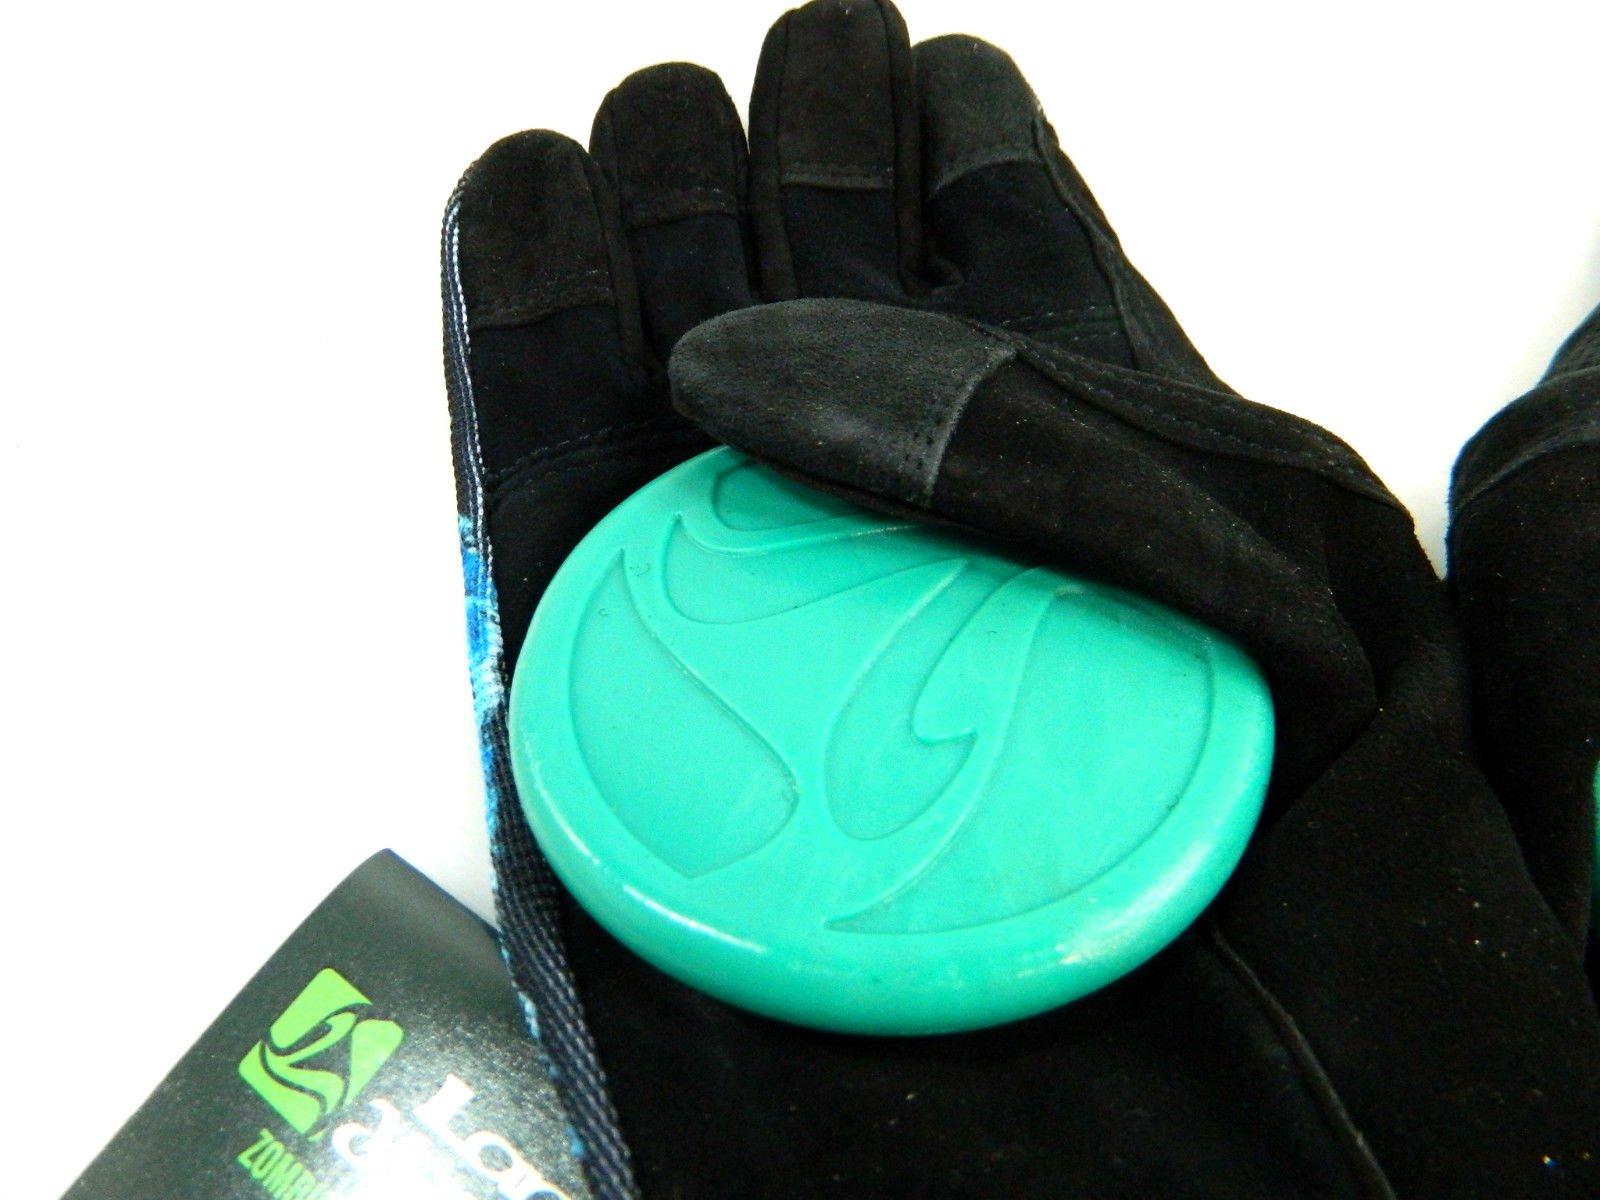 Landyachtz Freeride Zombie Slide Glove with Slide Pucks Size Small